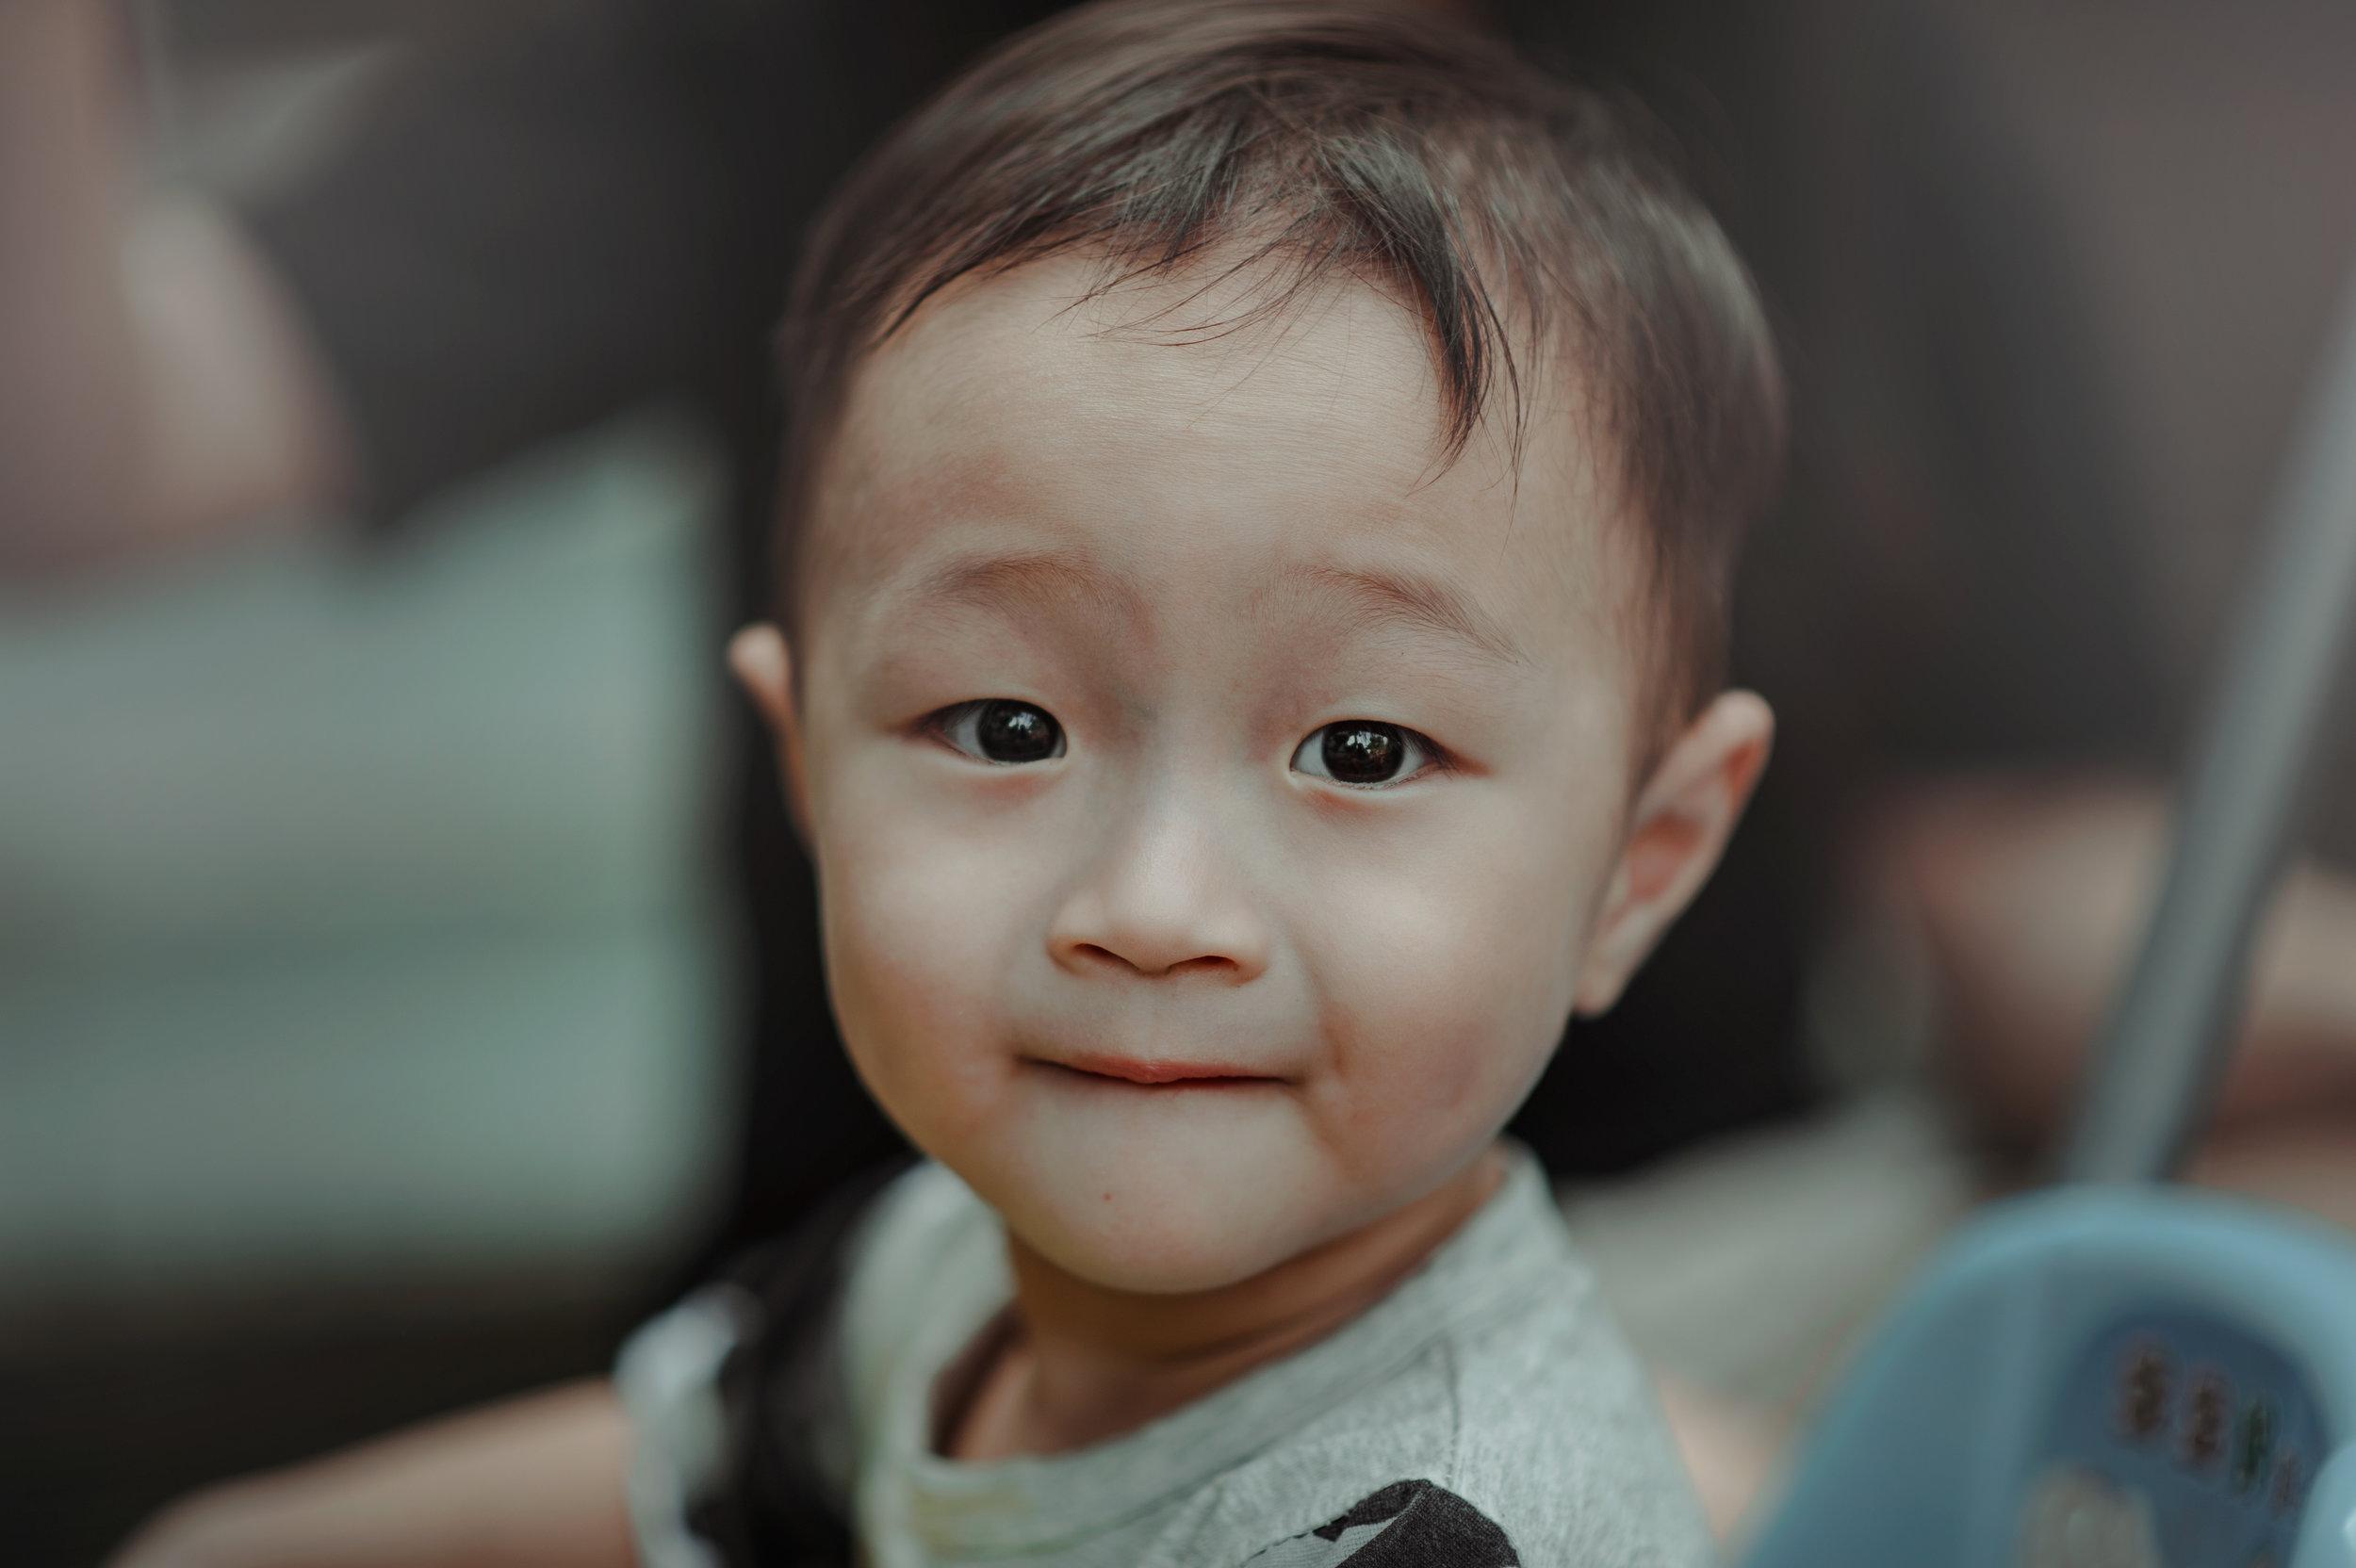 Asian boy toddler 2.jpeg